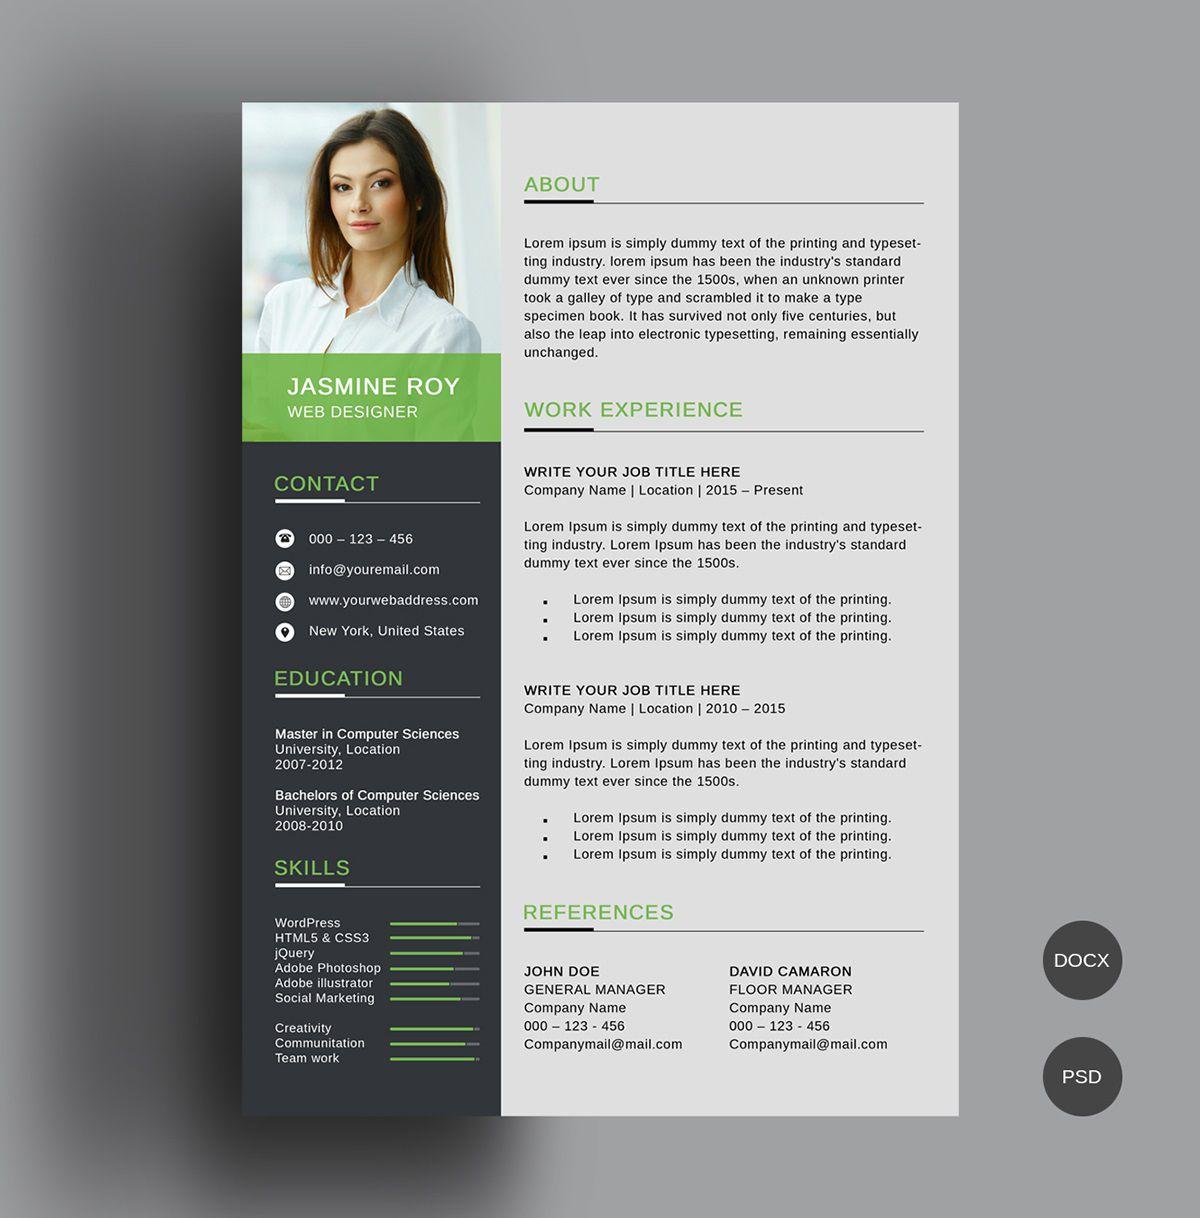 004 Unusual Free Download Resume Template Idea  Templates Word 2019 Pdf 2020Full